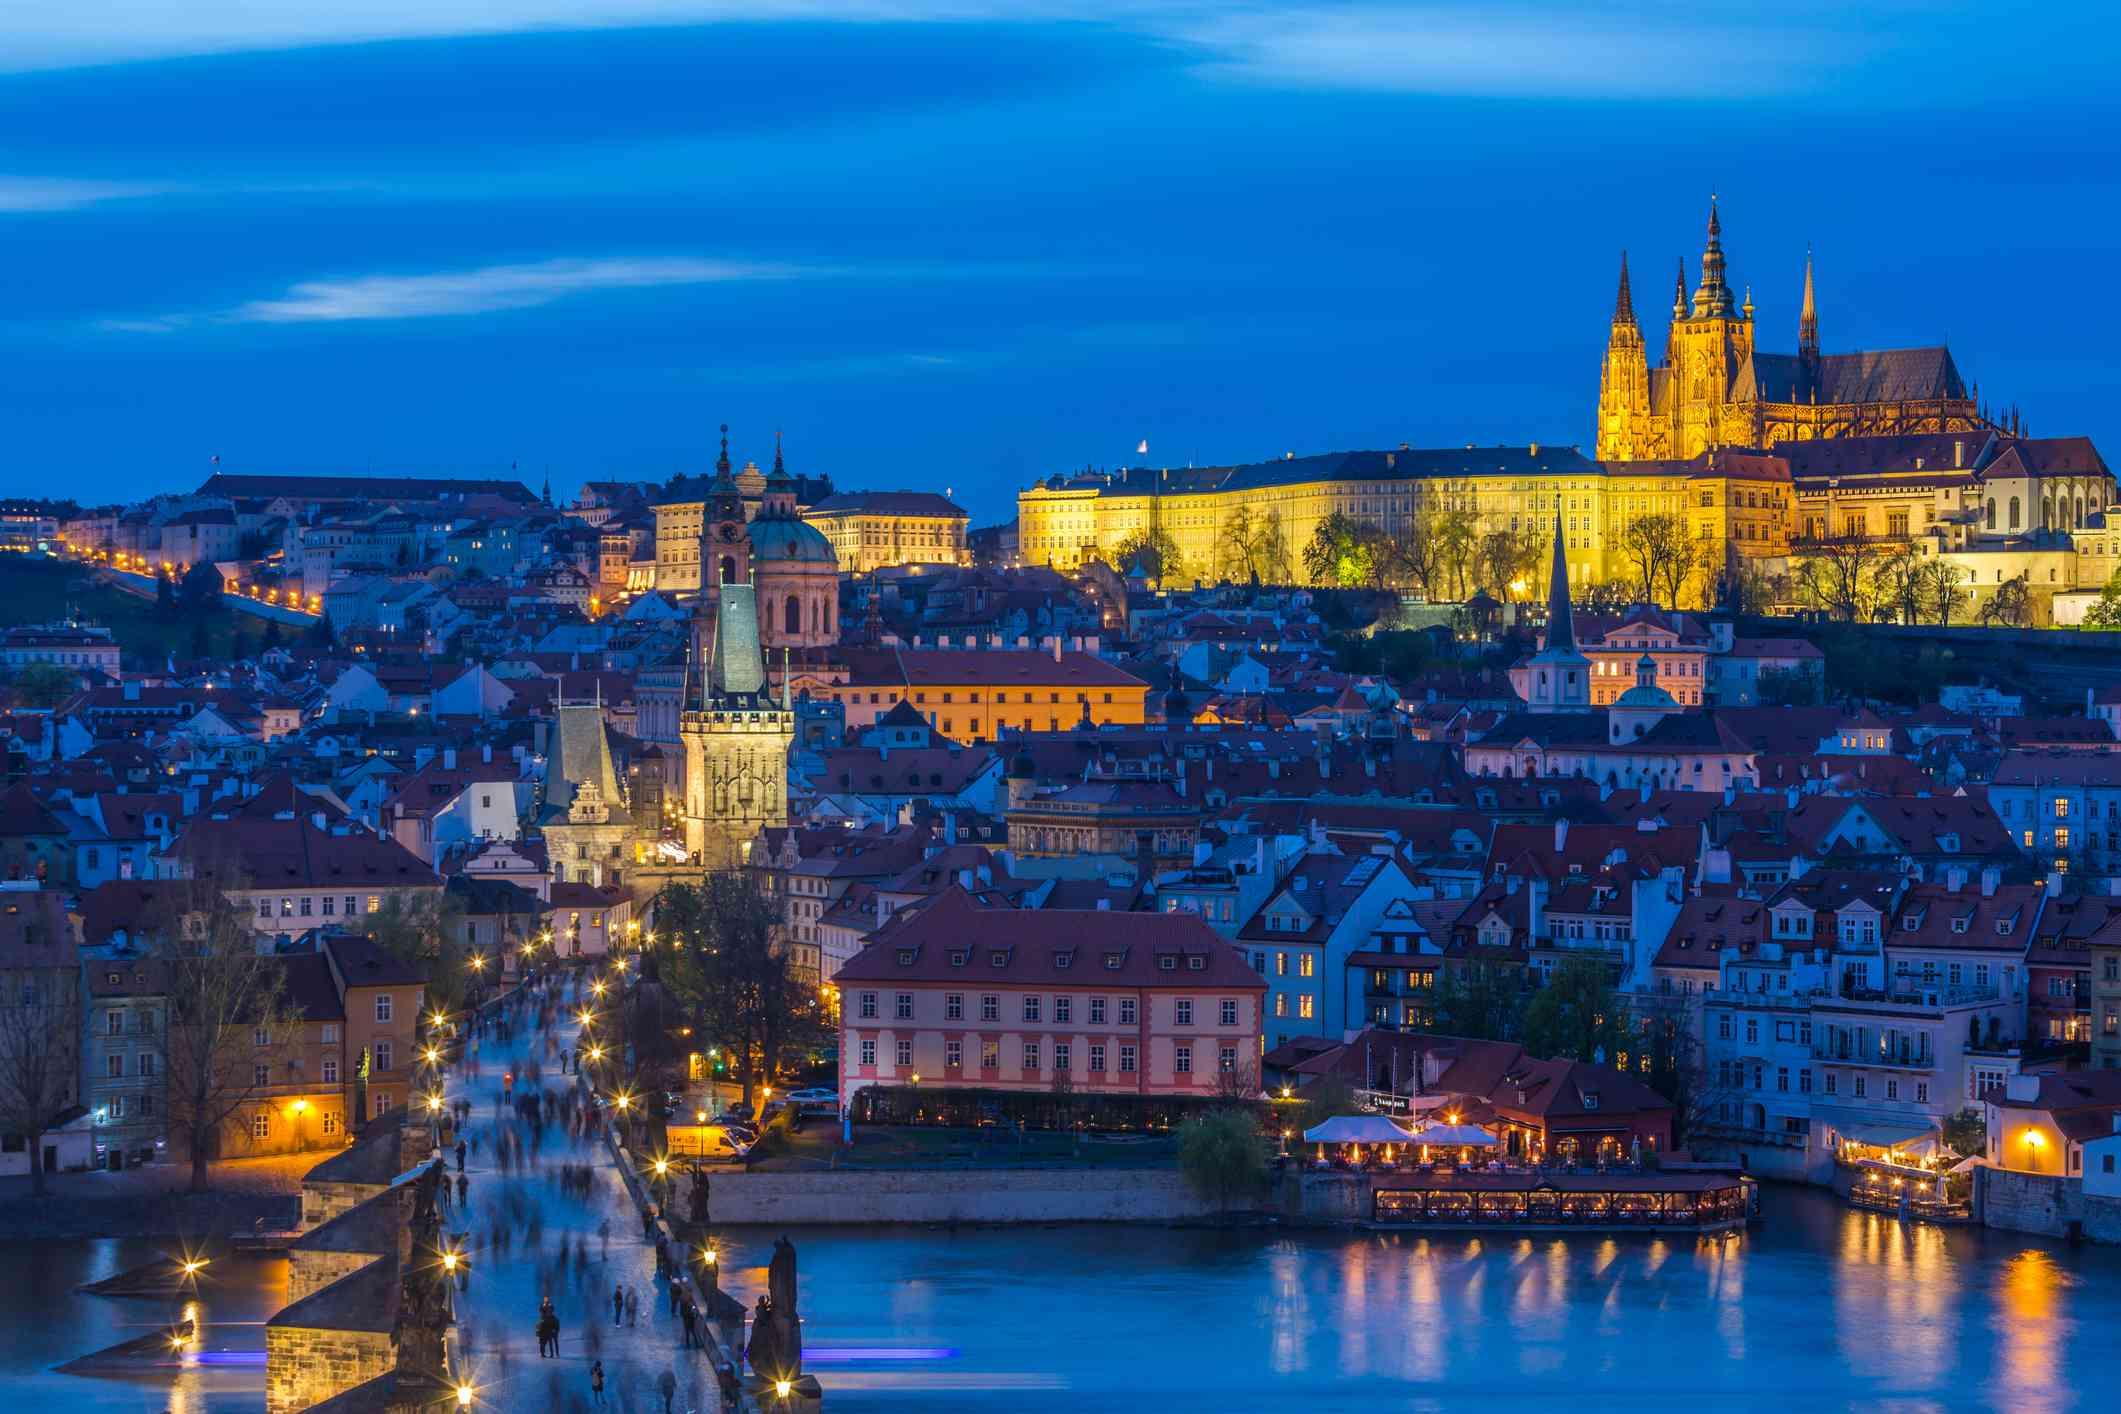 dusk in charles bridge with mala strana distric and Prague Castle.